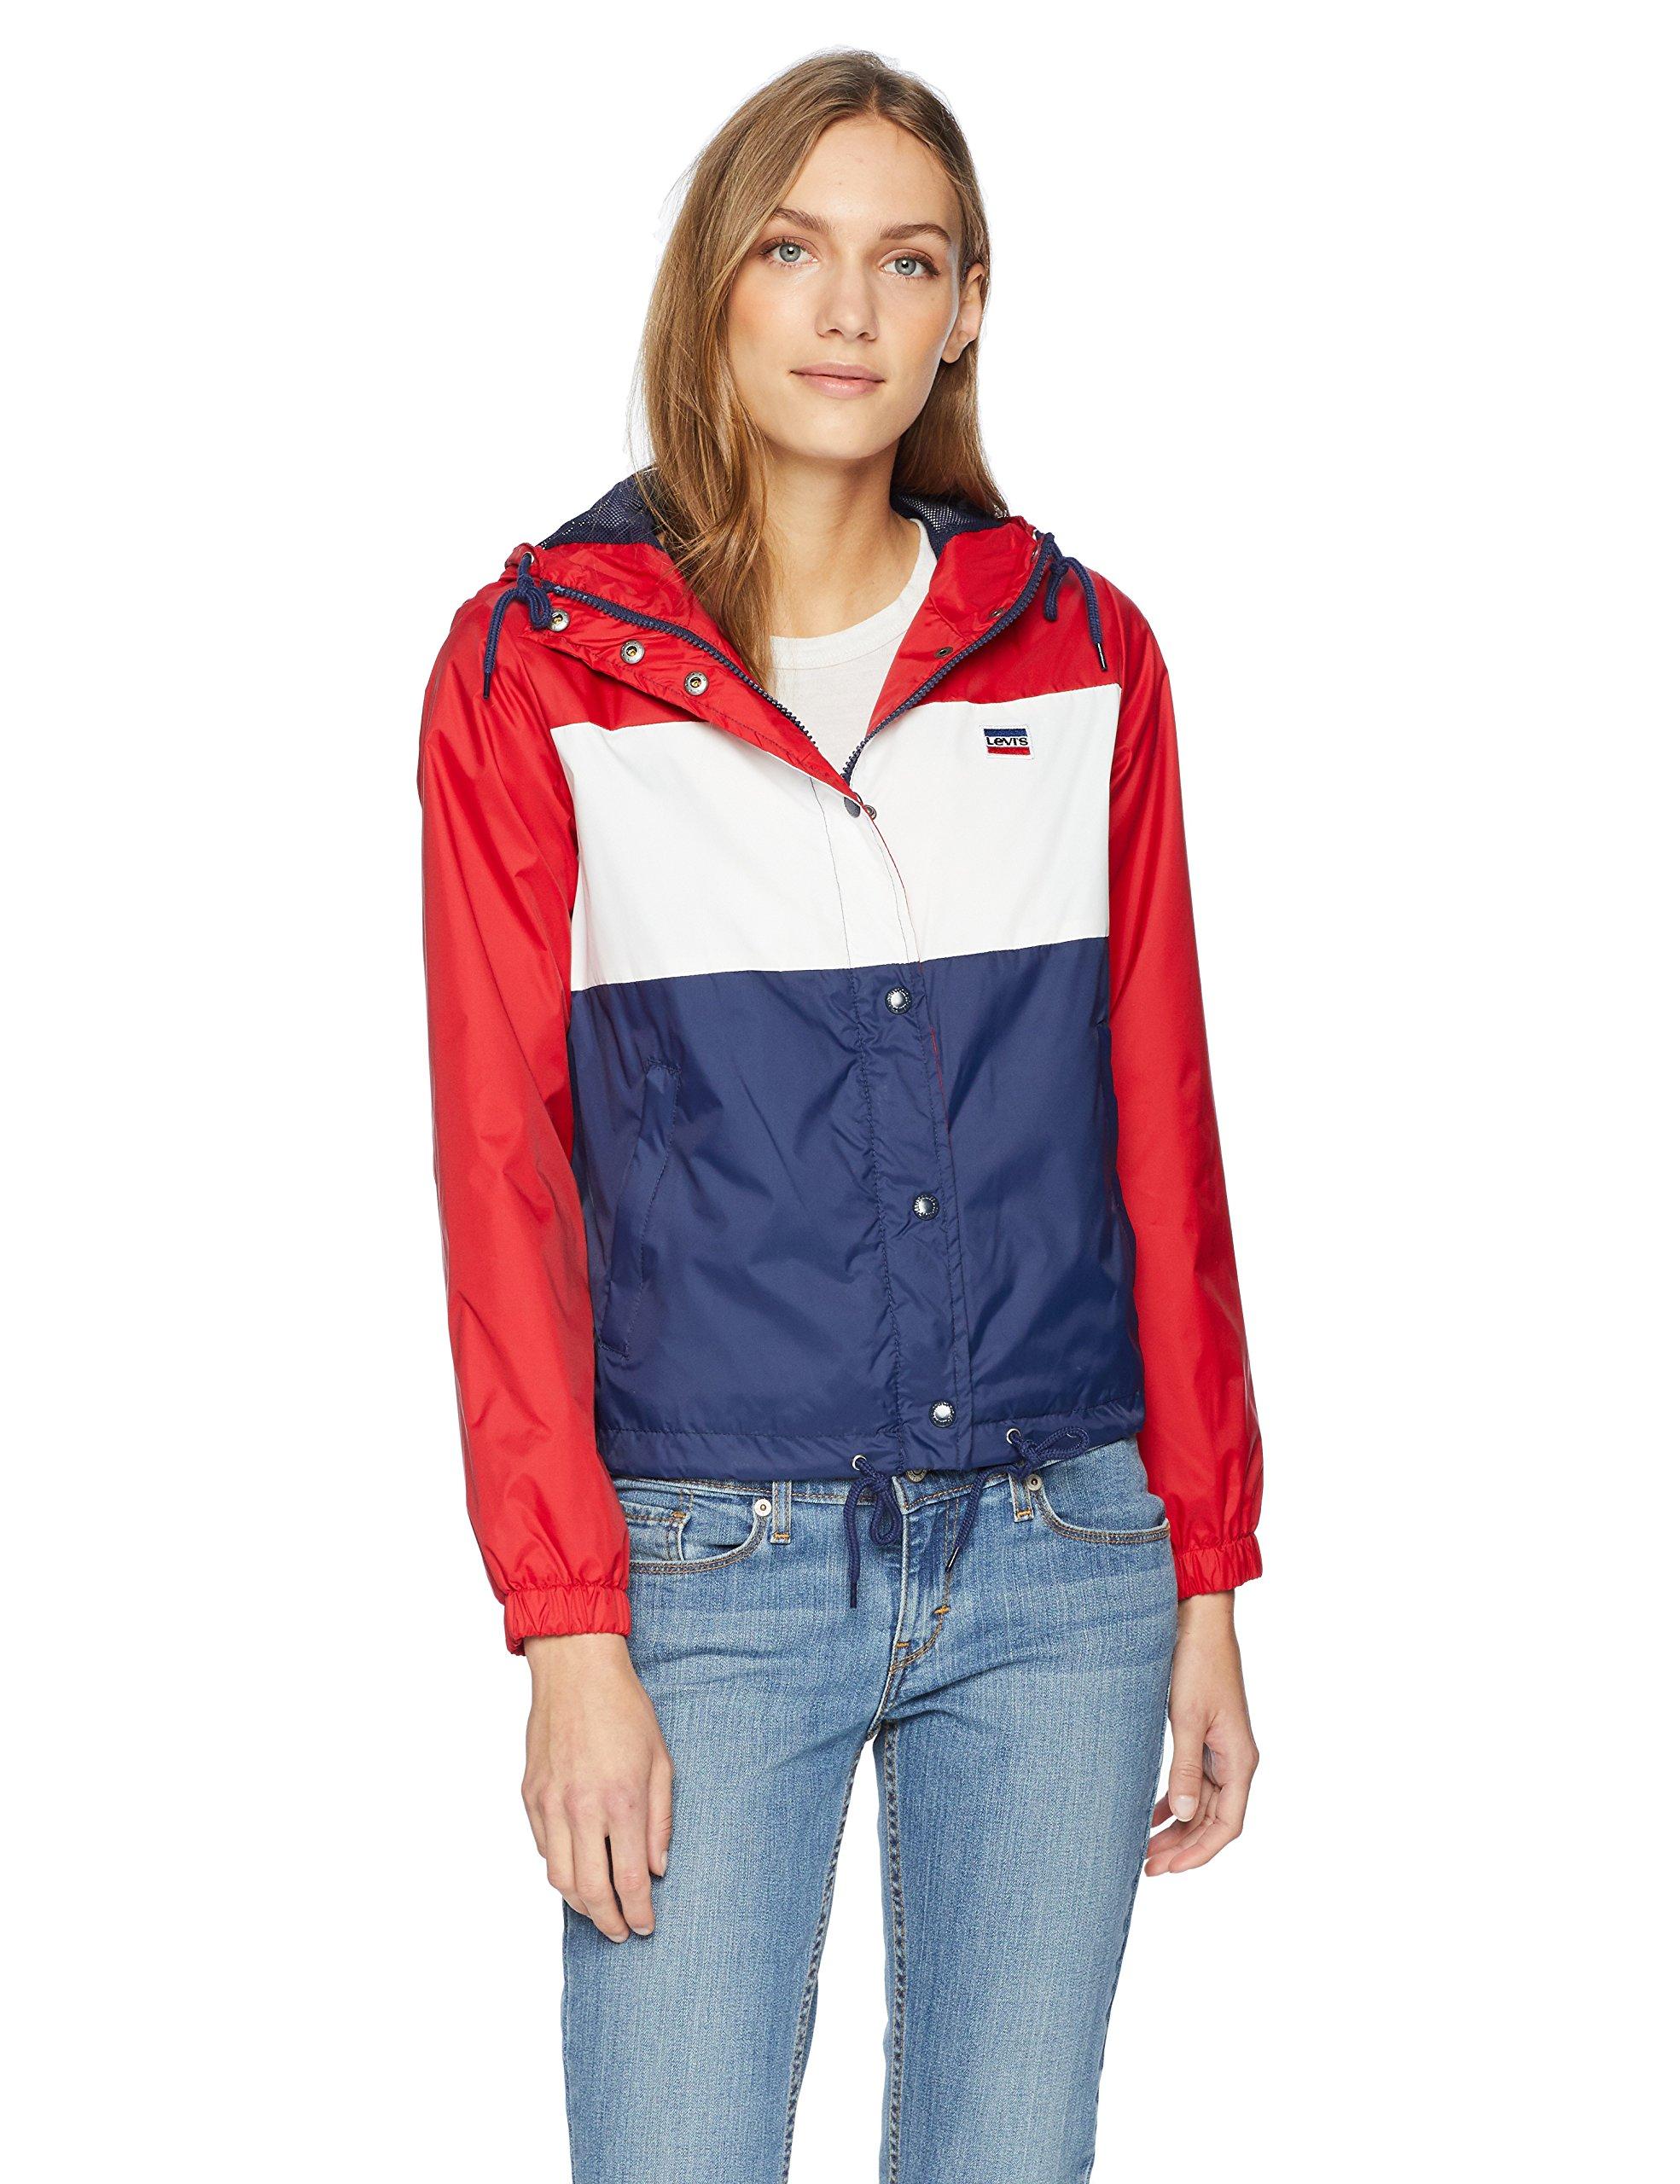 Levi's Women's Retro Hooded Track Jacket, Rinse, S